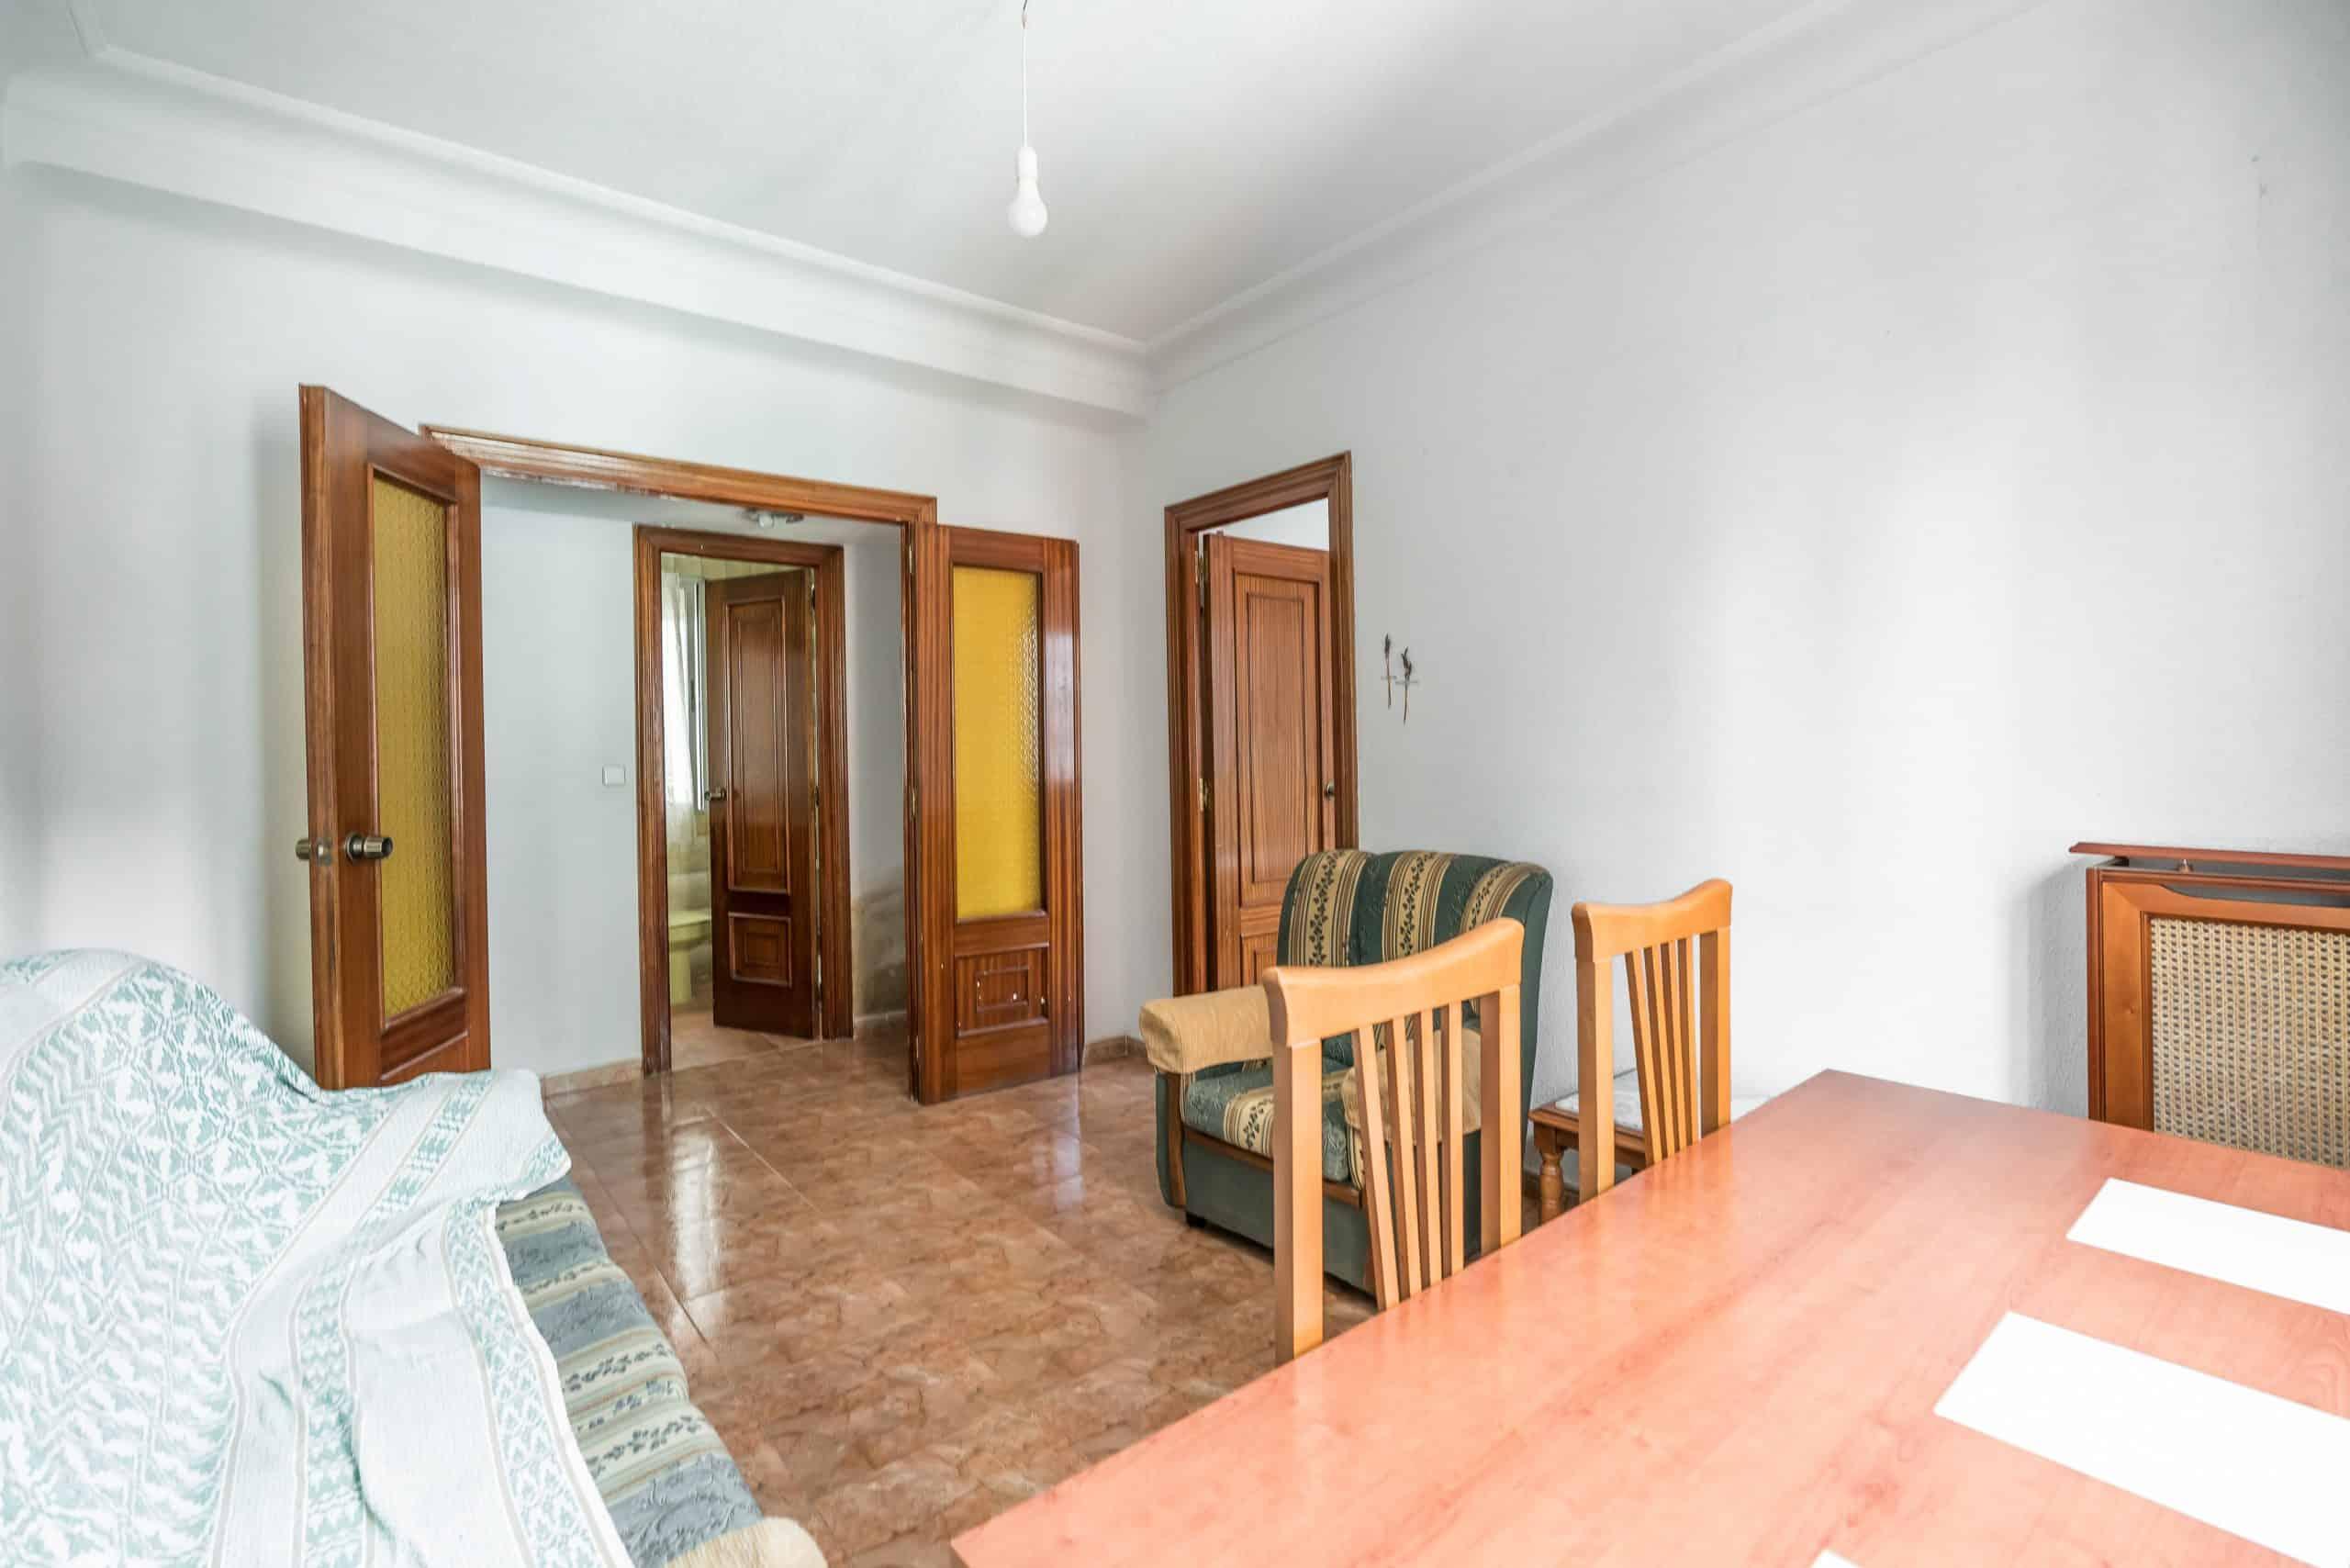 Agencia Inmobiliaria de Madrid-FUTUROCASA-calle Embajadores-Chopera-Arganzuela1 SALON (5)